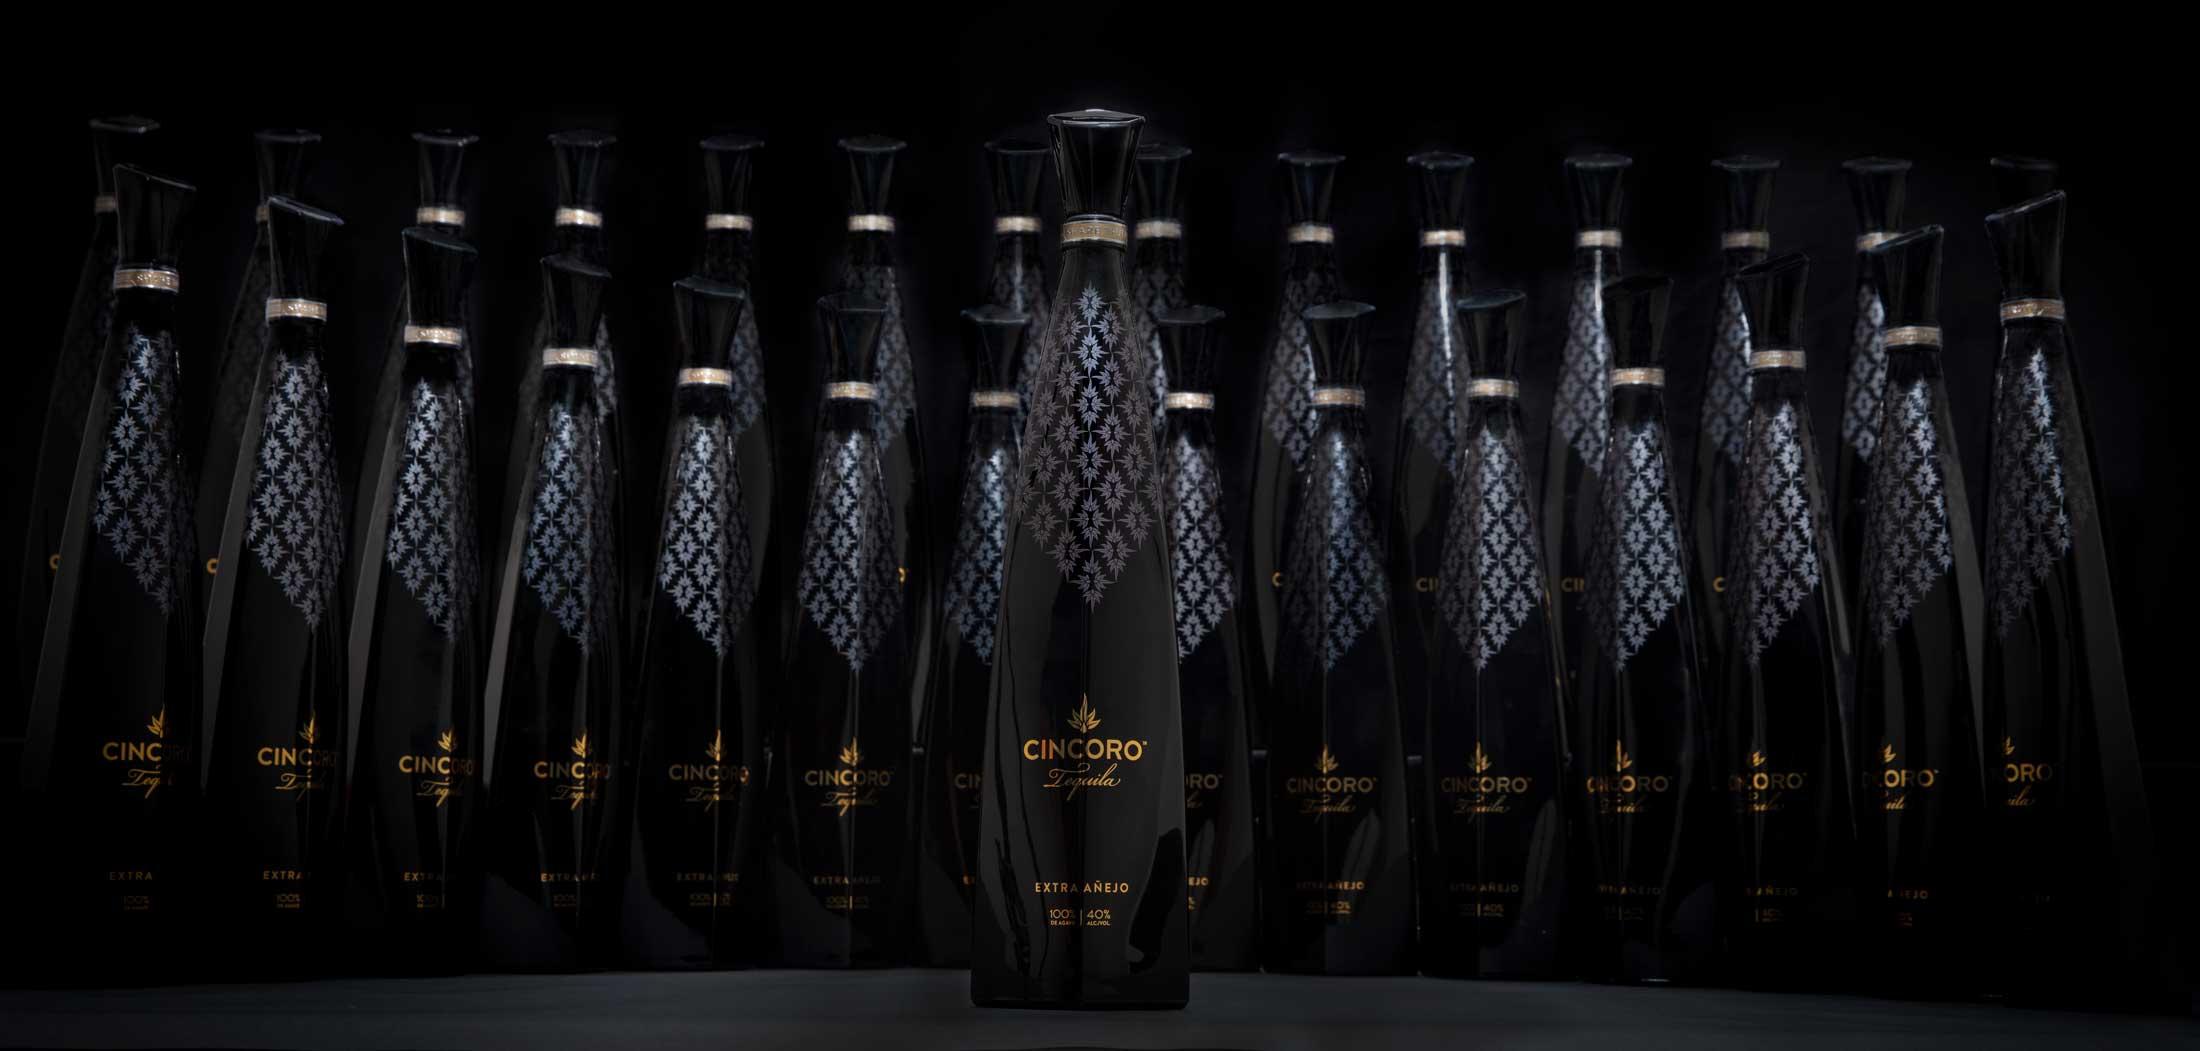 Bottle Photography for Cincoro Tequila shot on black of 29 bottles.